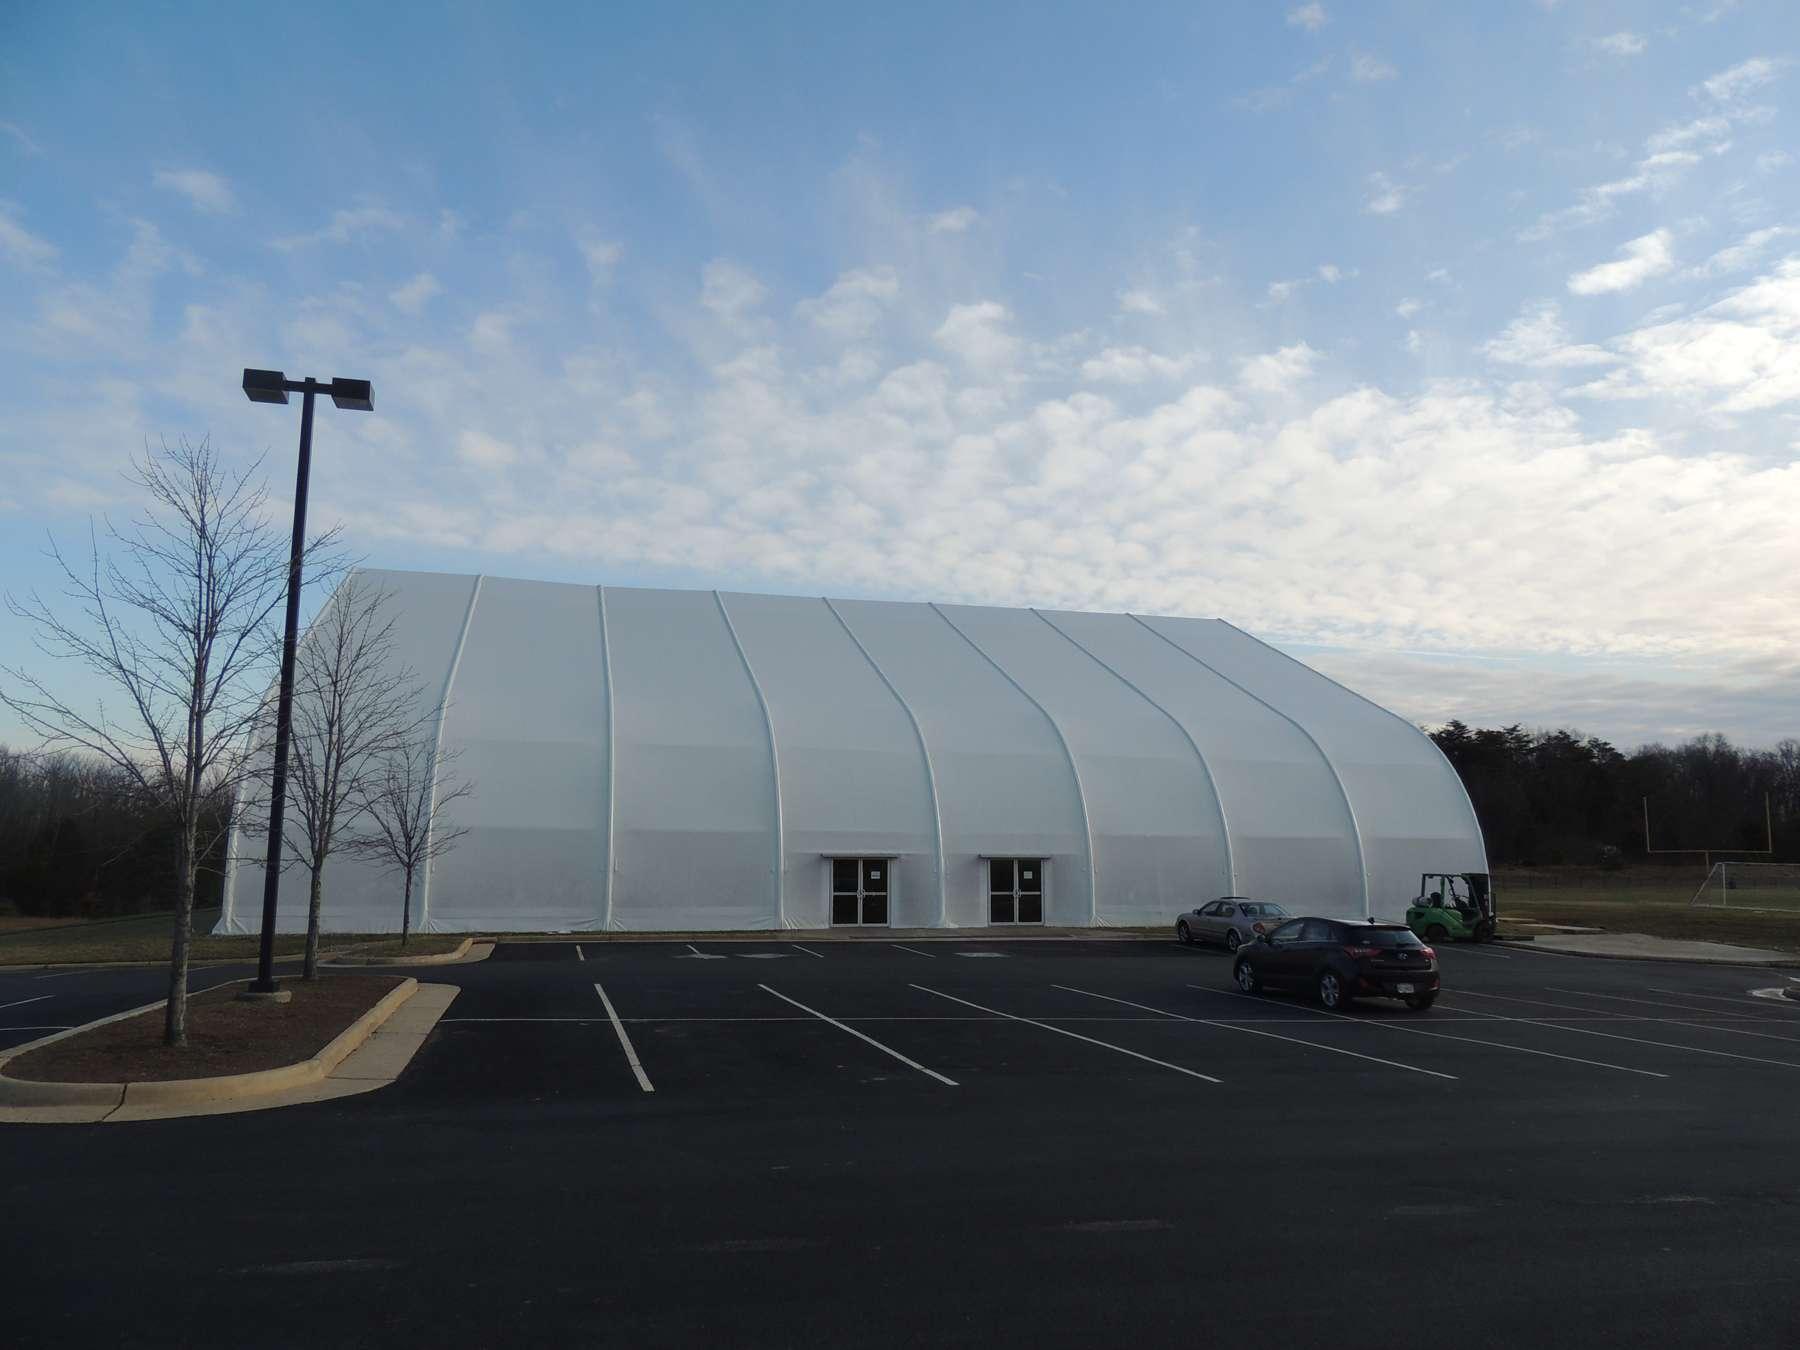 Fabric building on parking lot exterior shot